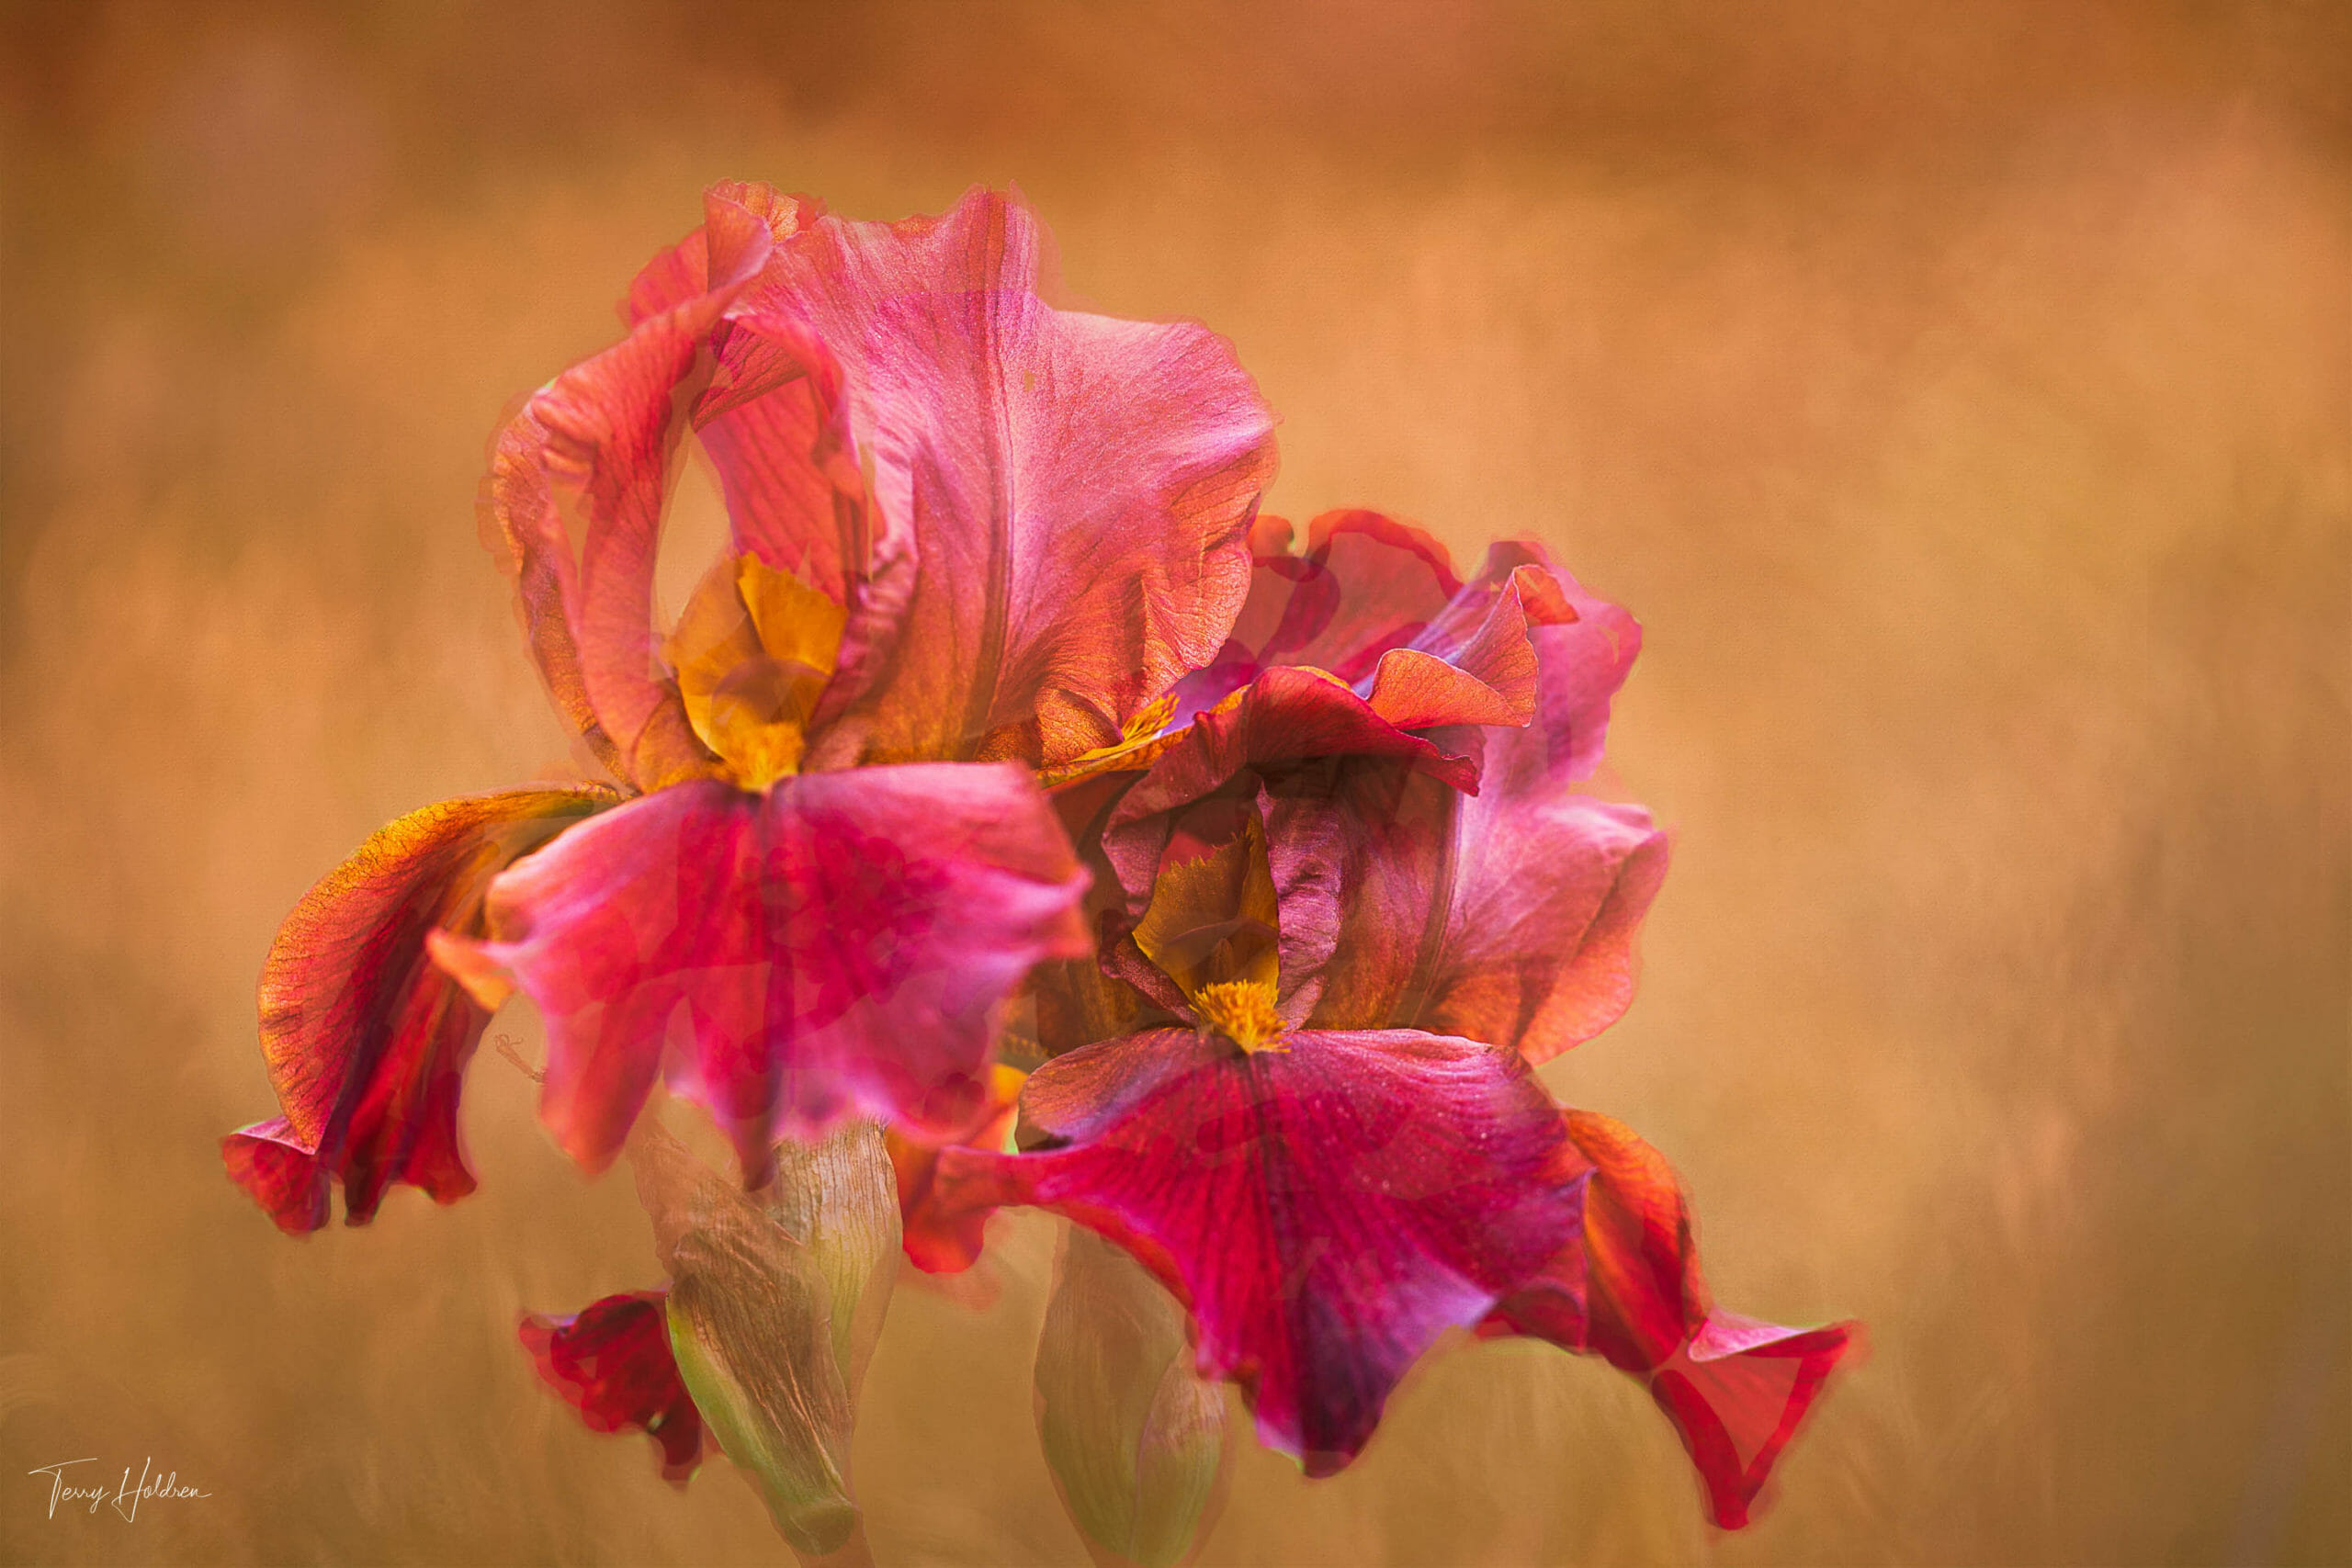 Copyright Terry Holdren 2020 iPhotography Textured flower photos 3